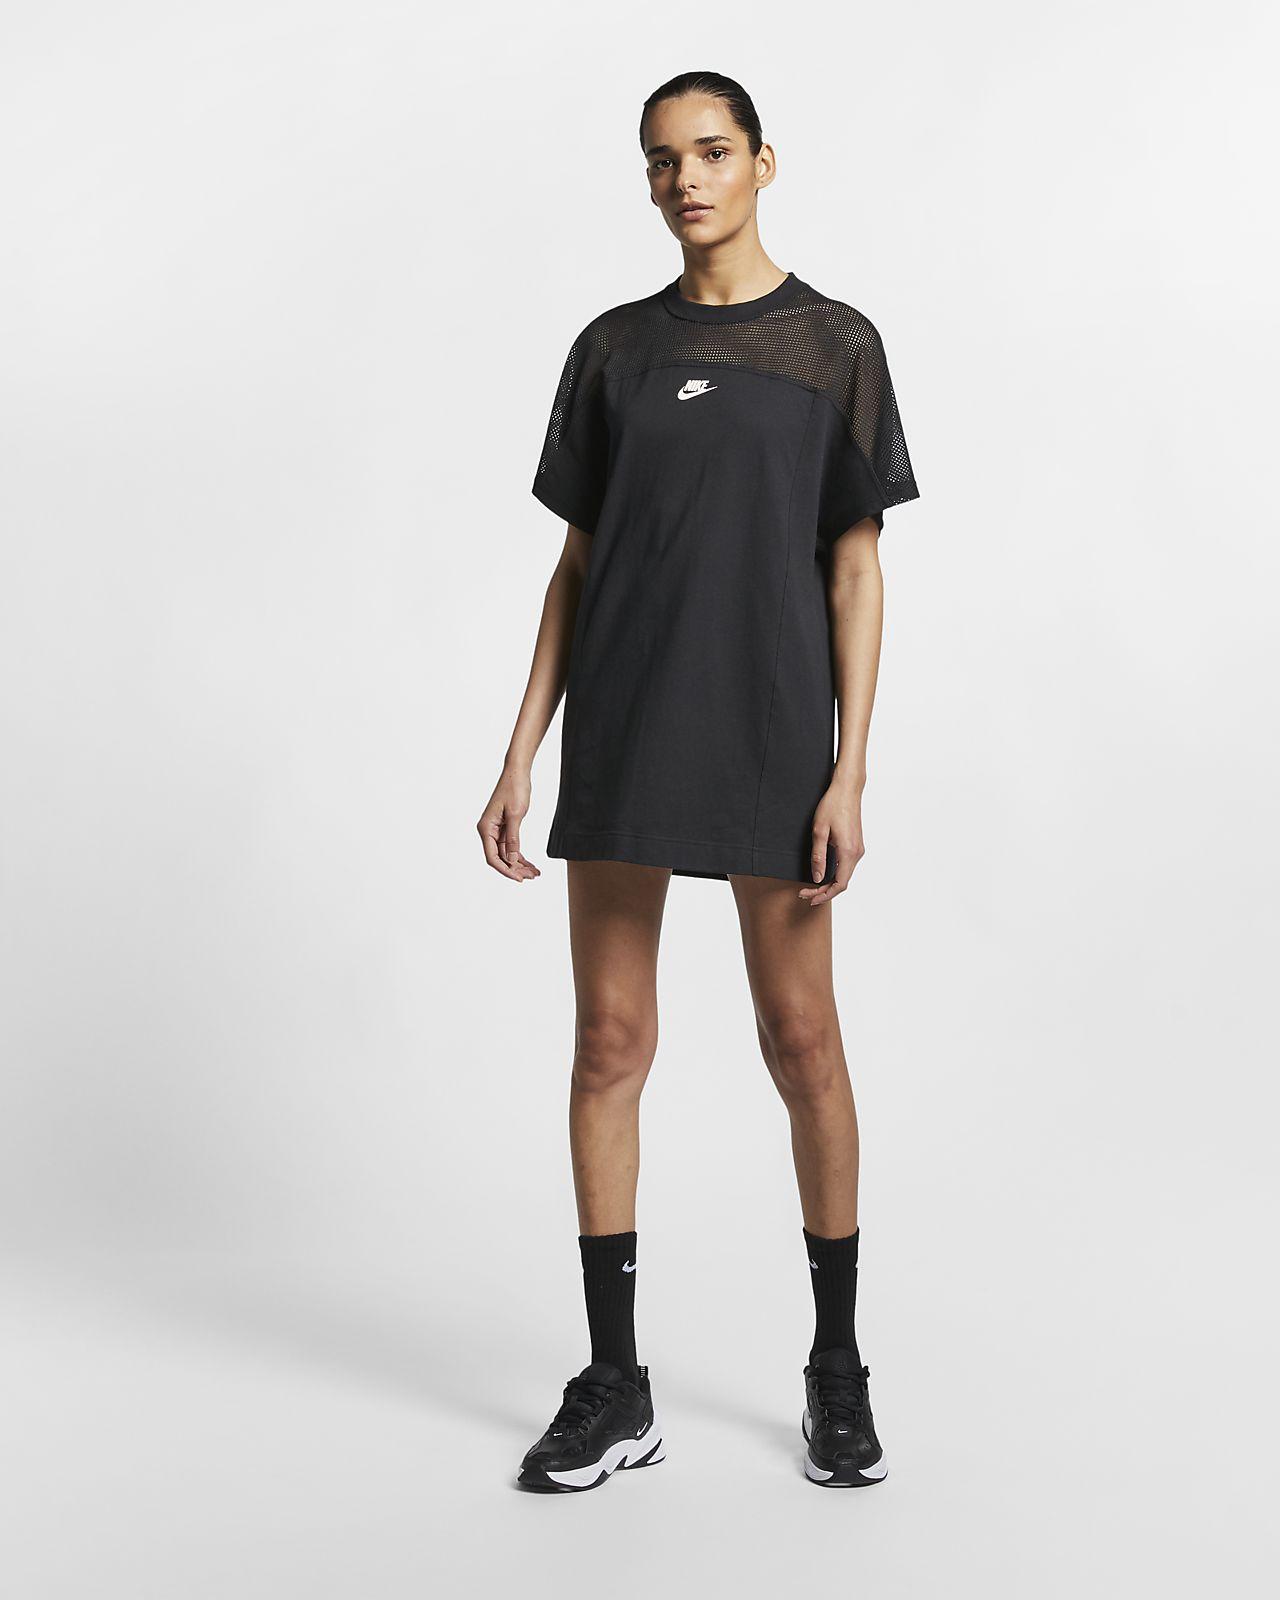 ecdfe8942b8d Nike Dri Fit Cotton Runners Attitude T Shirt Womens – EDGE ...